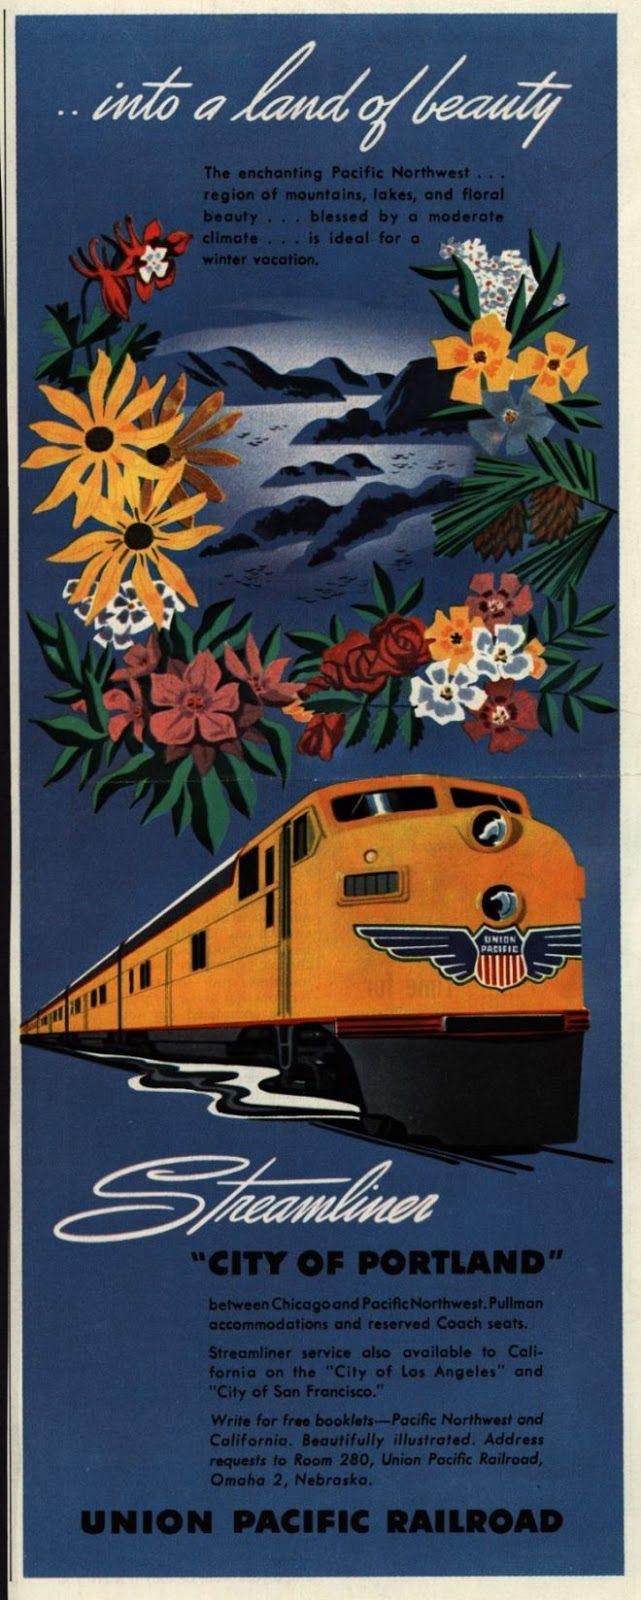 Union Pacific Railroad Vintage Posters